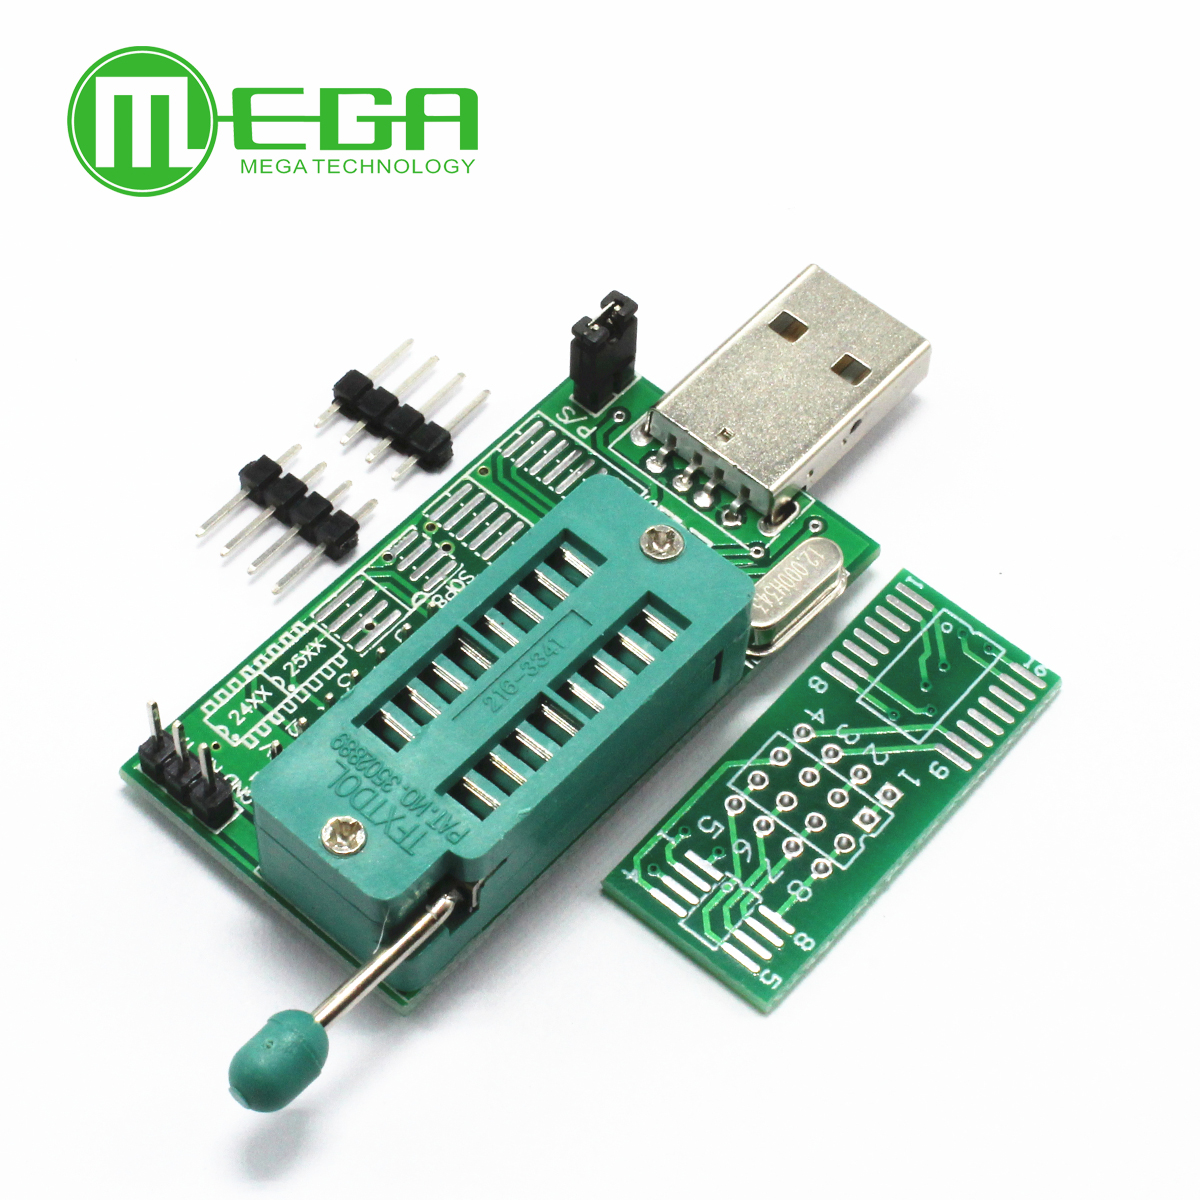 1pcs Ch341a 24 25 Reprogrammed Dvd Router Bi0 S Brush Multifunctional Usb Programmer